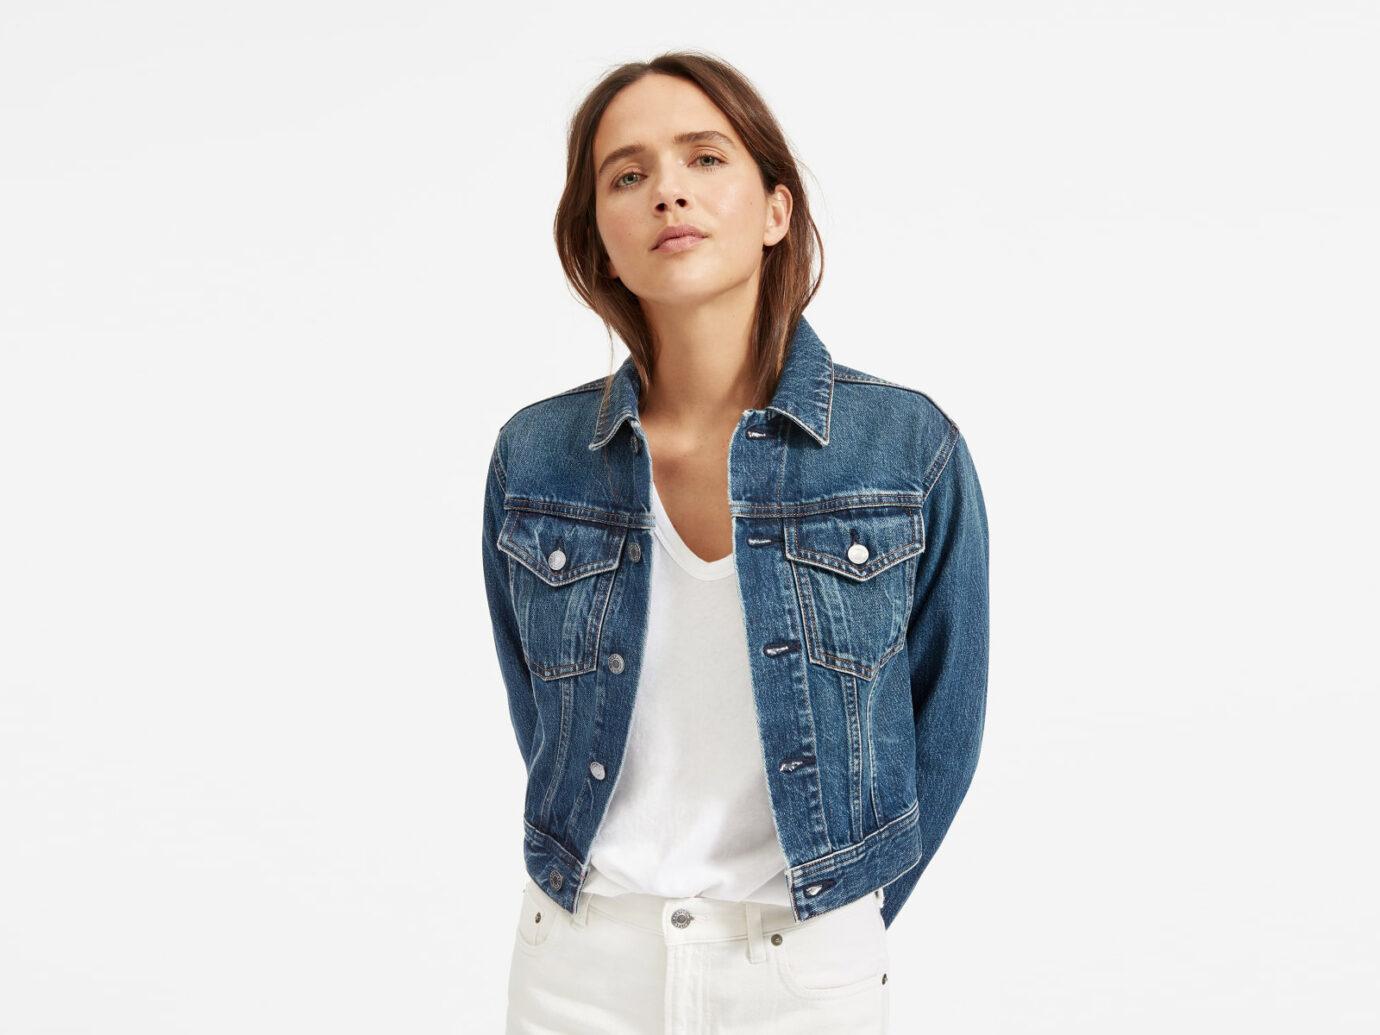 The Cropped Denim Jacket